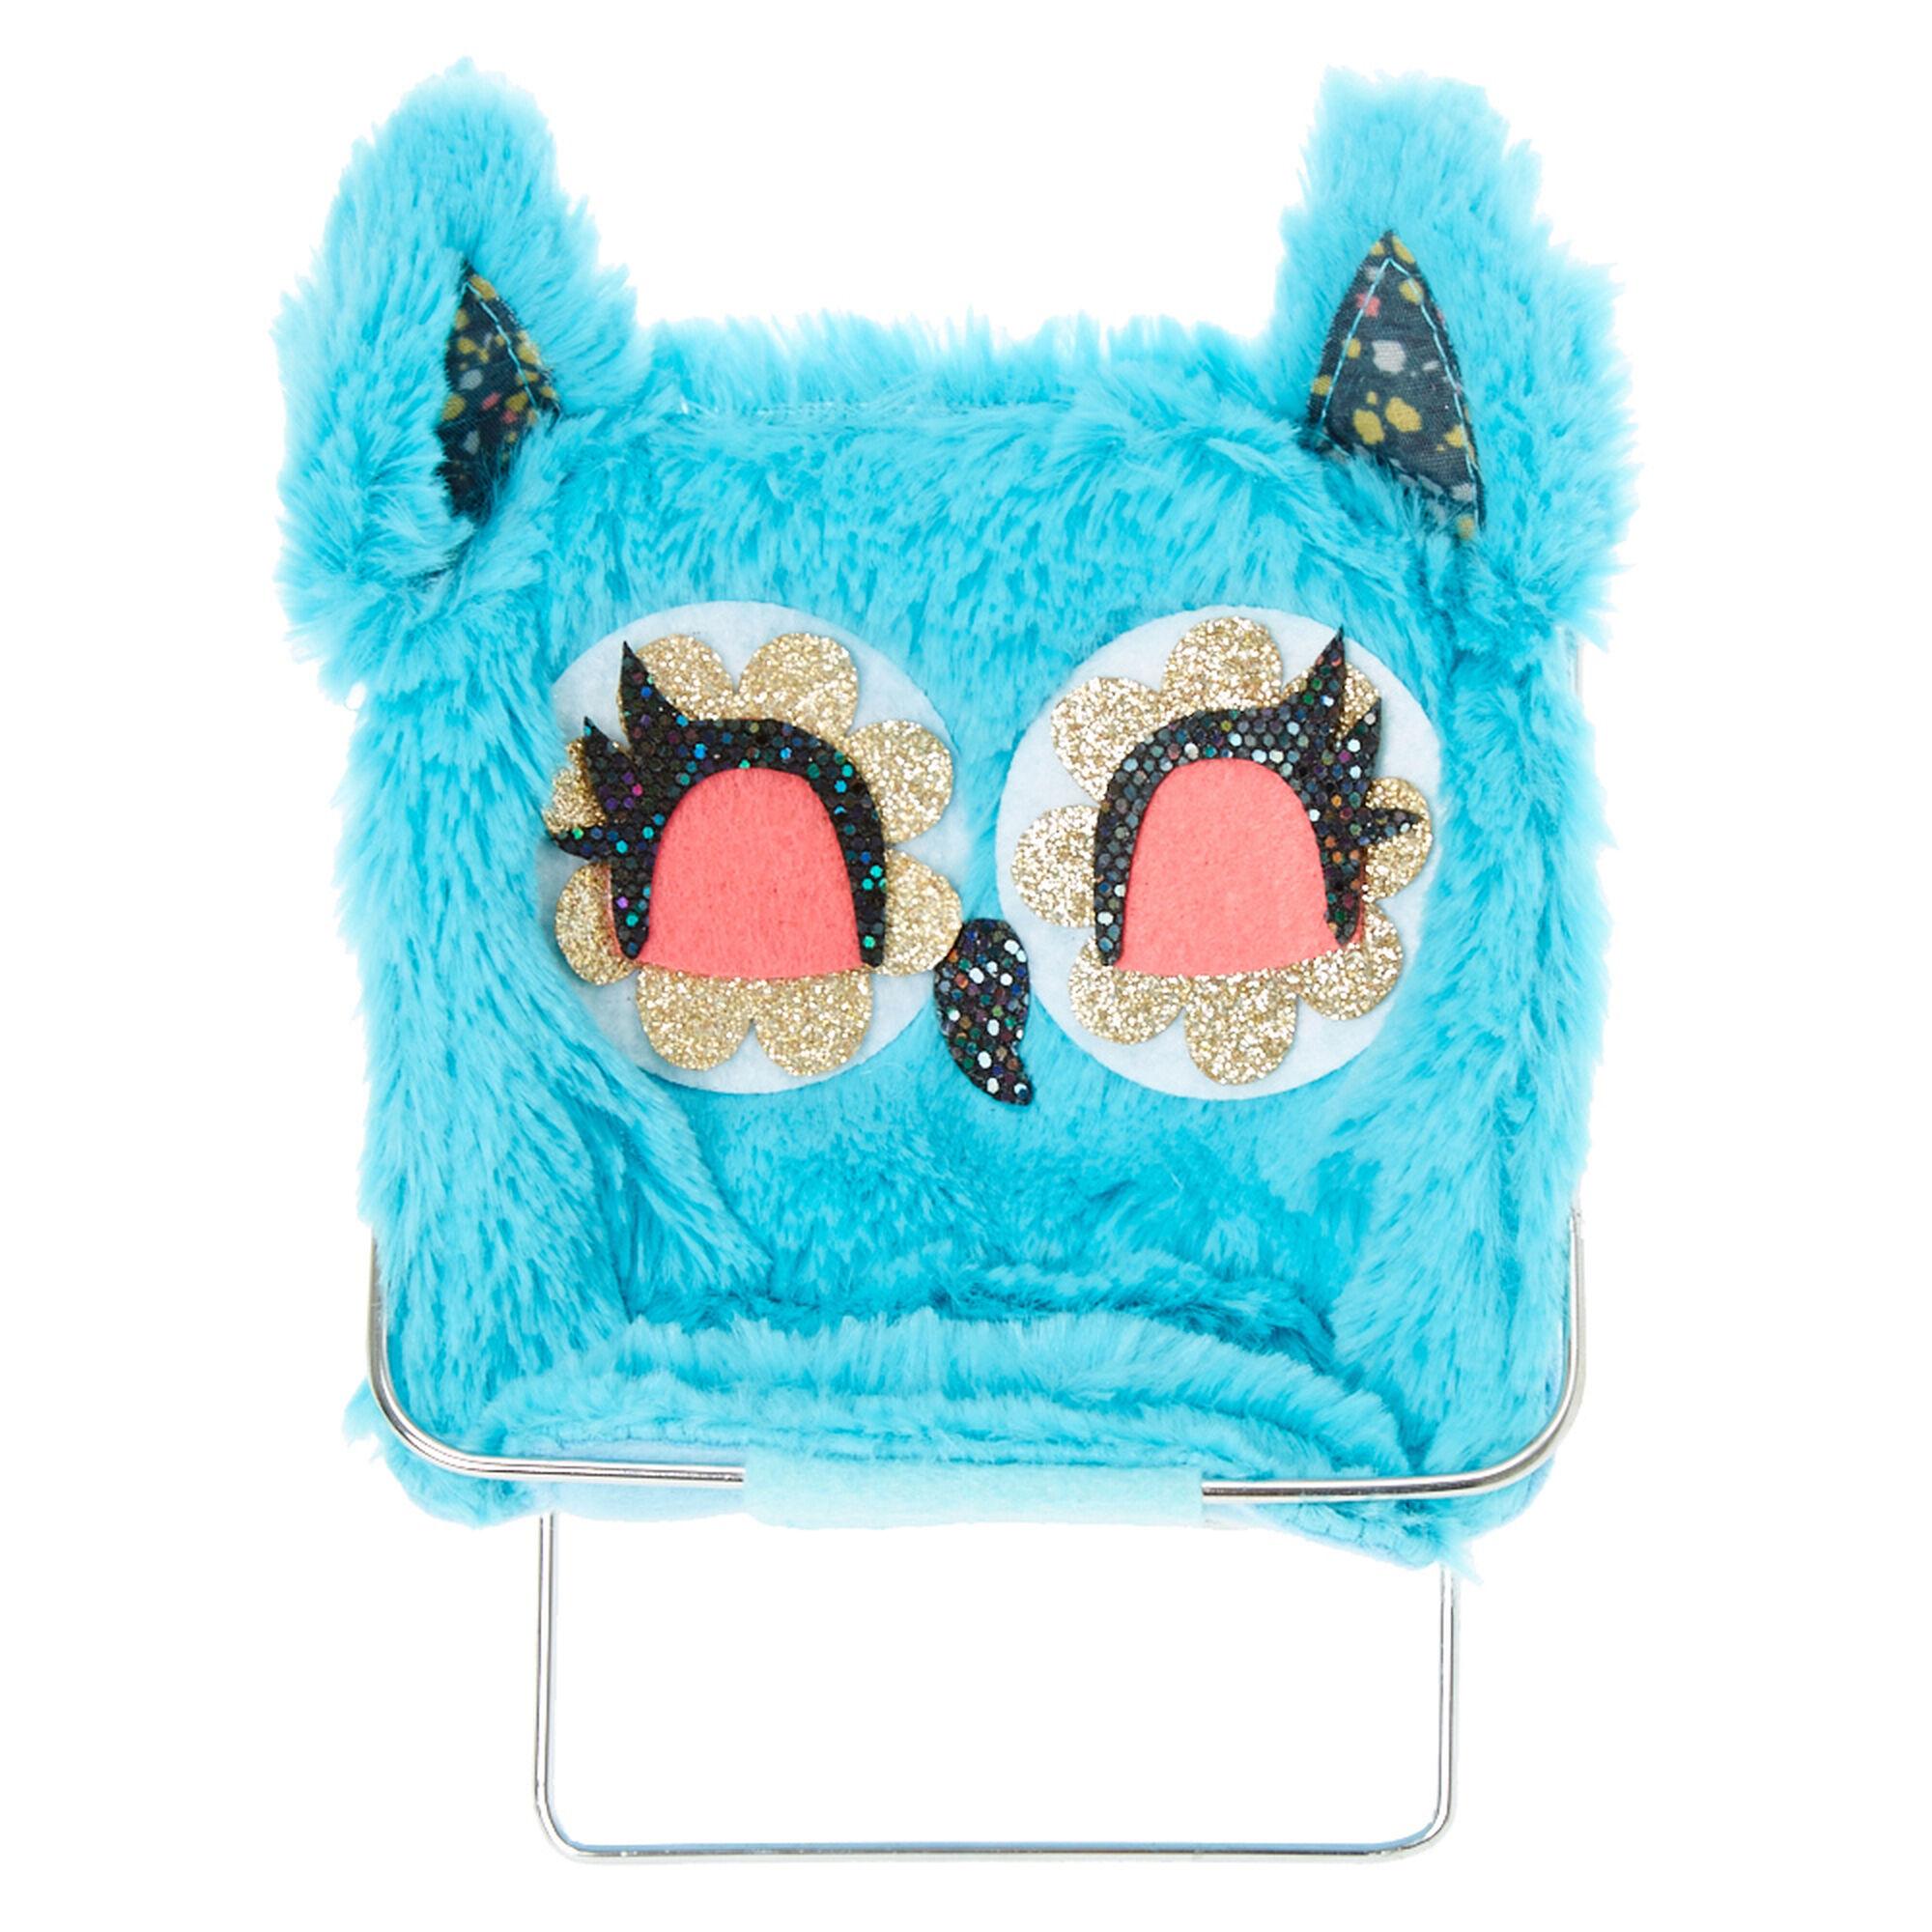 Soft Blue Owl Phone Holder Chair